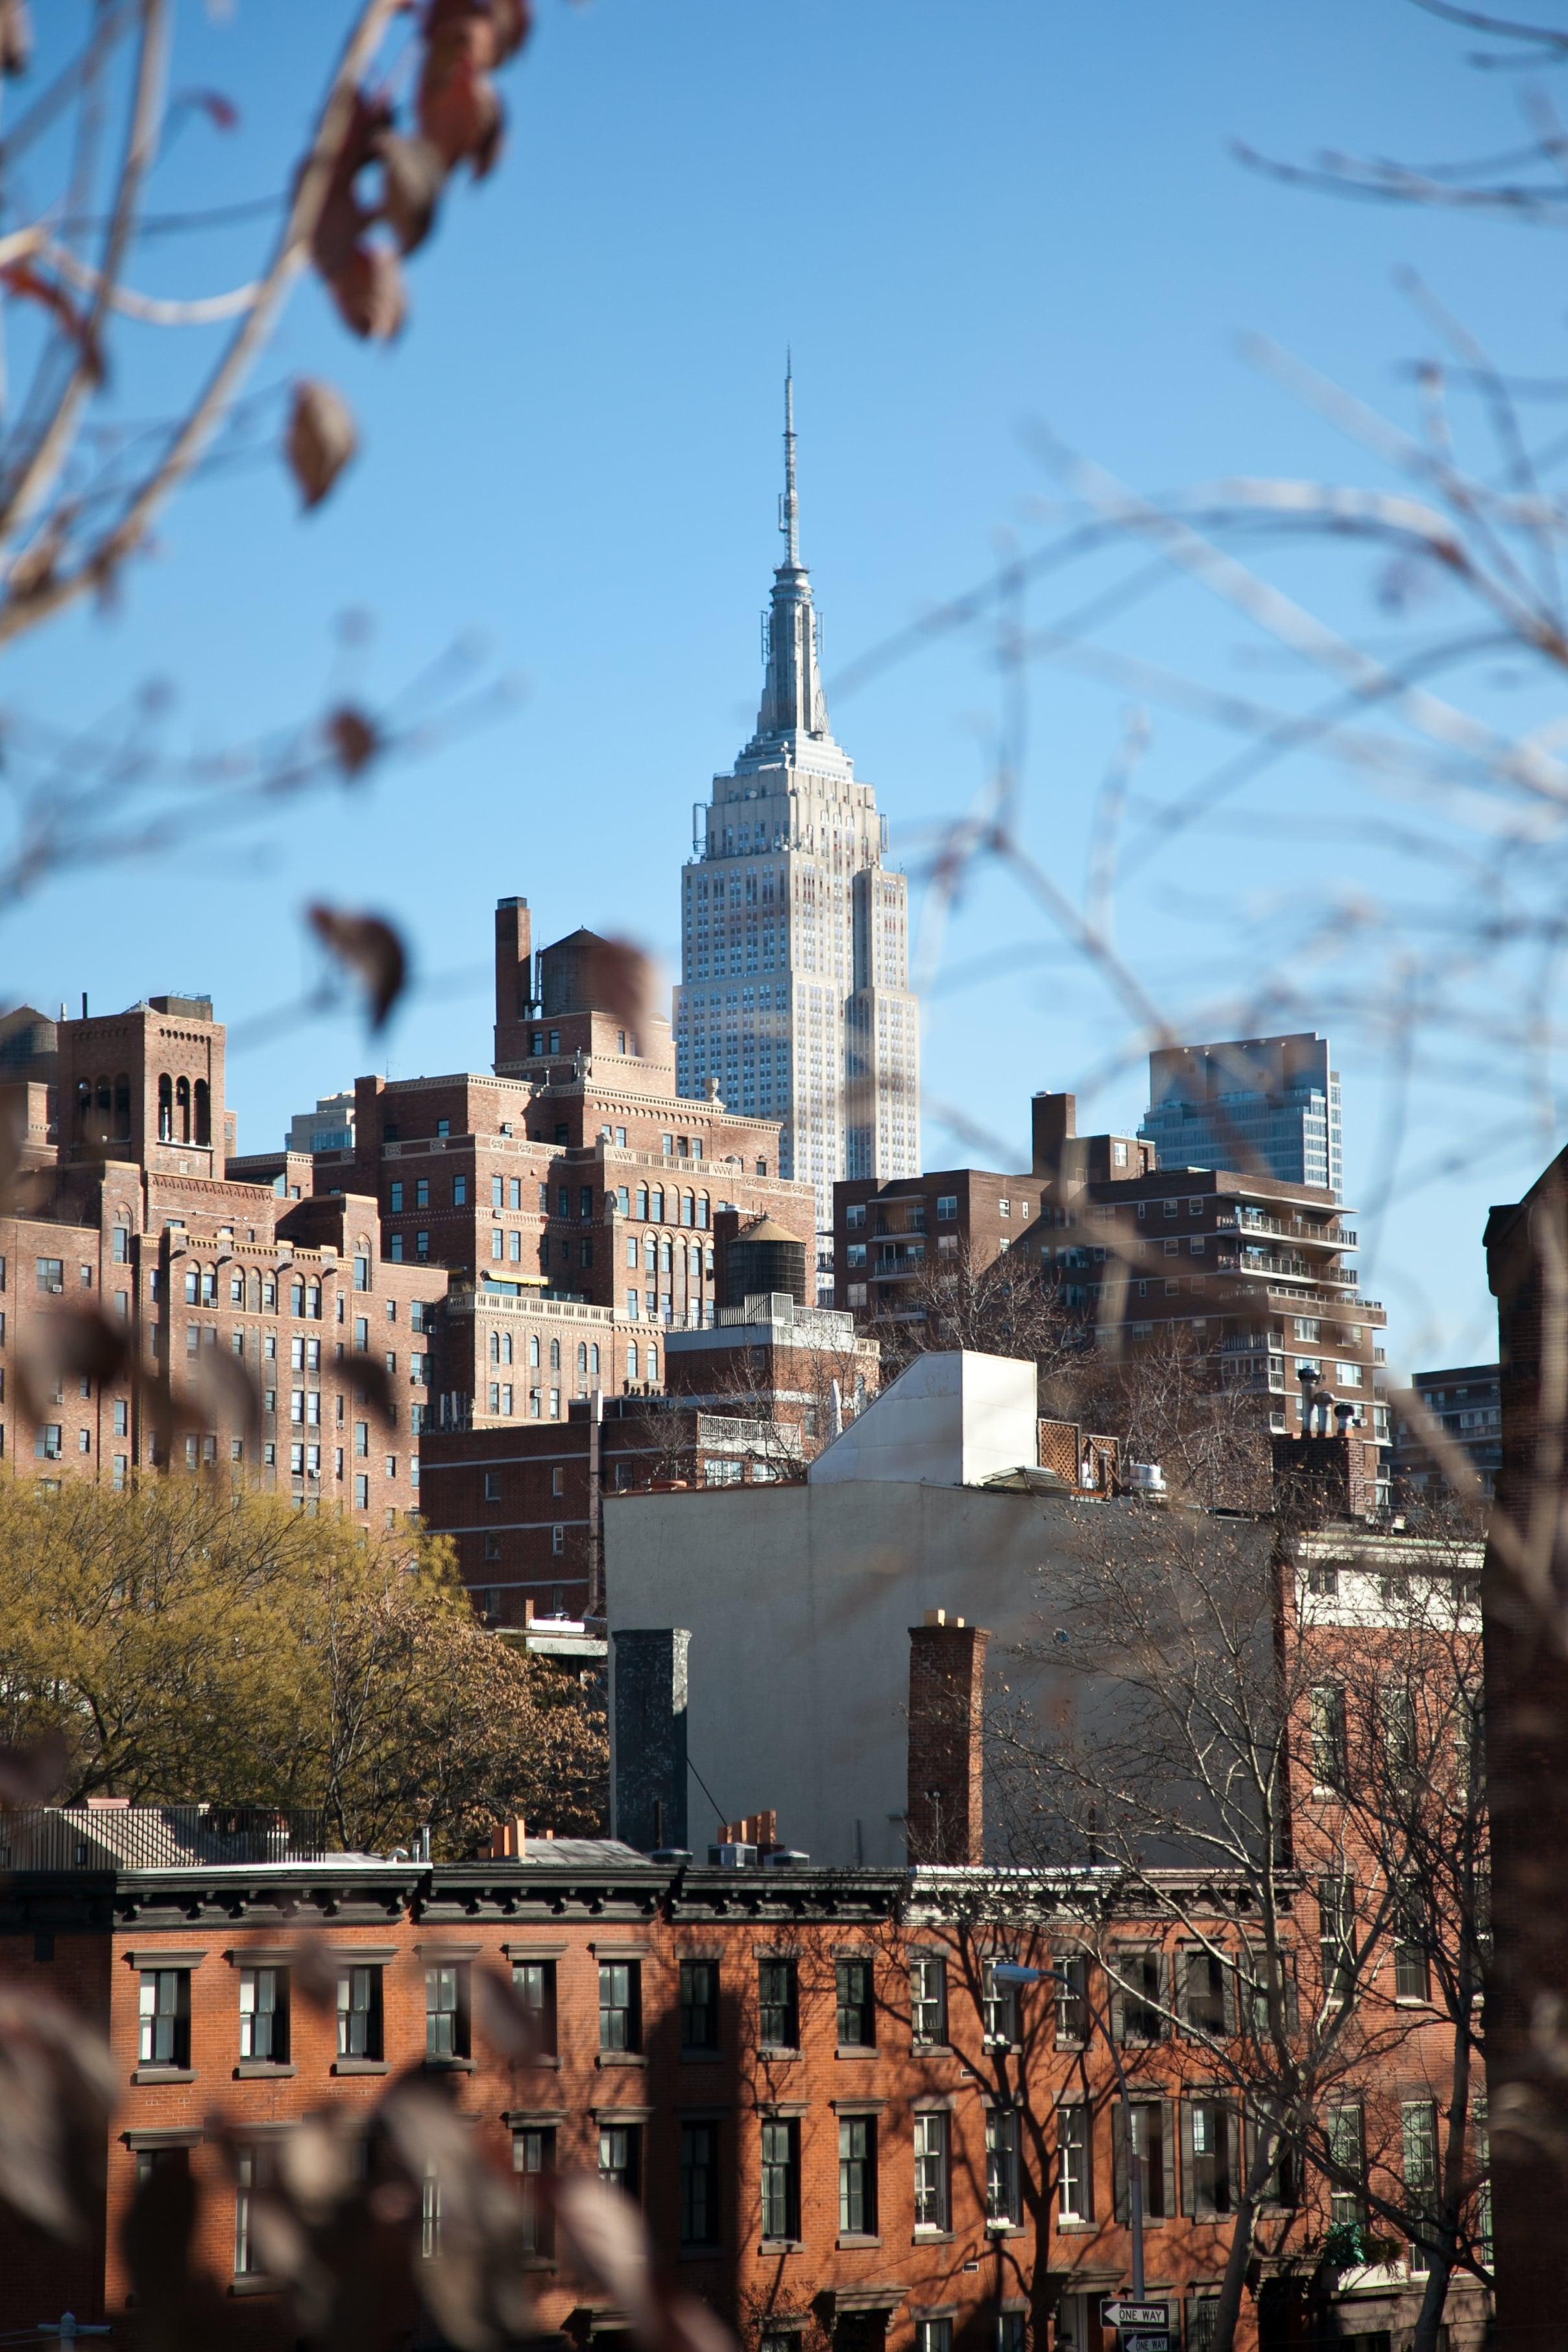 trisa-taro-empire state building-winter-new york city.jpg